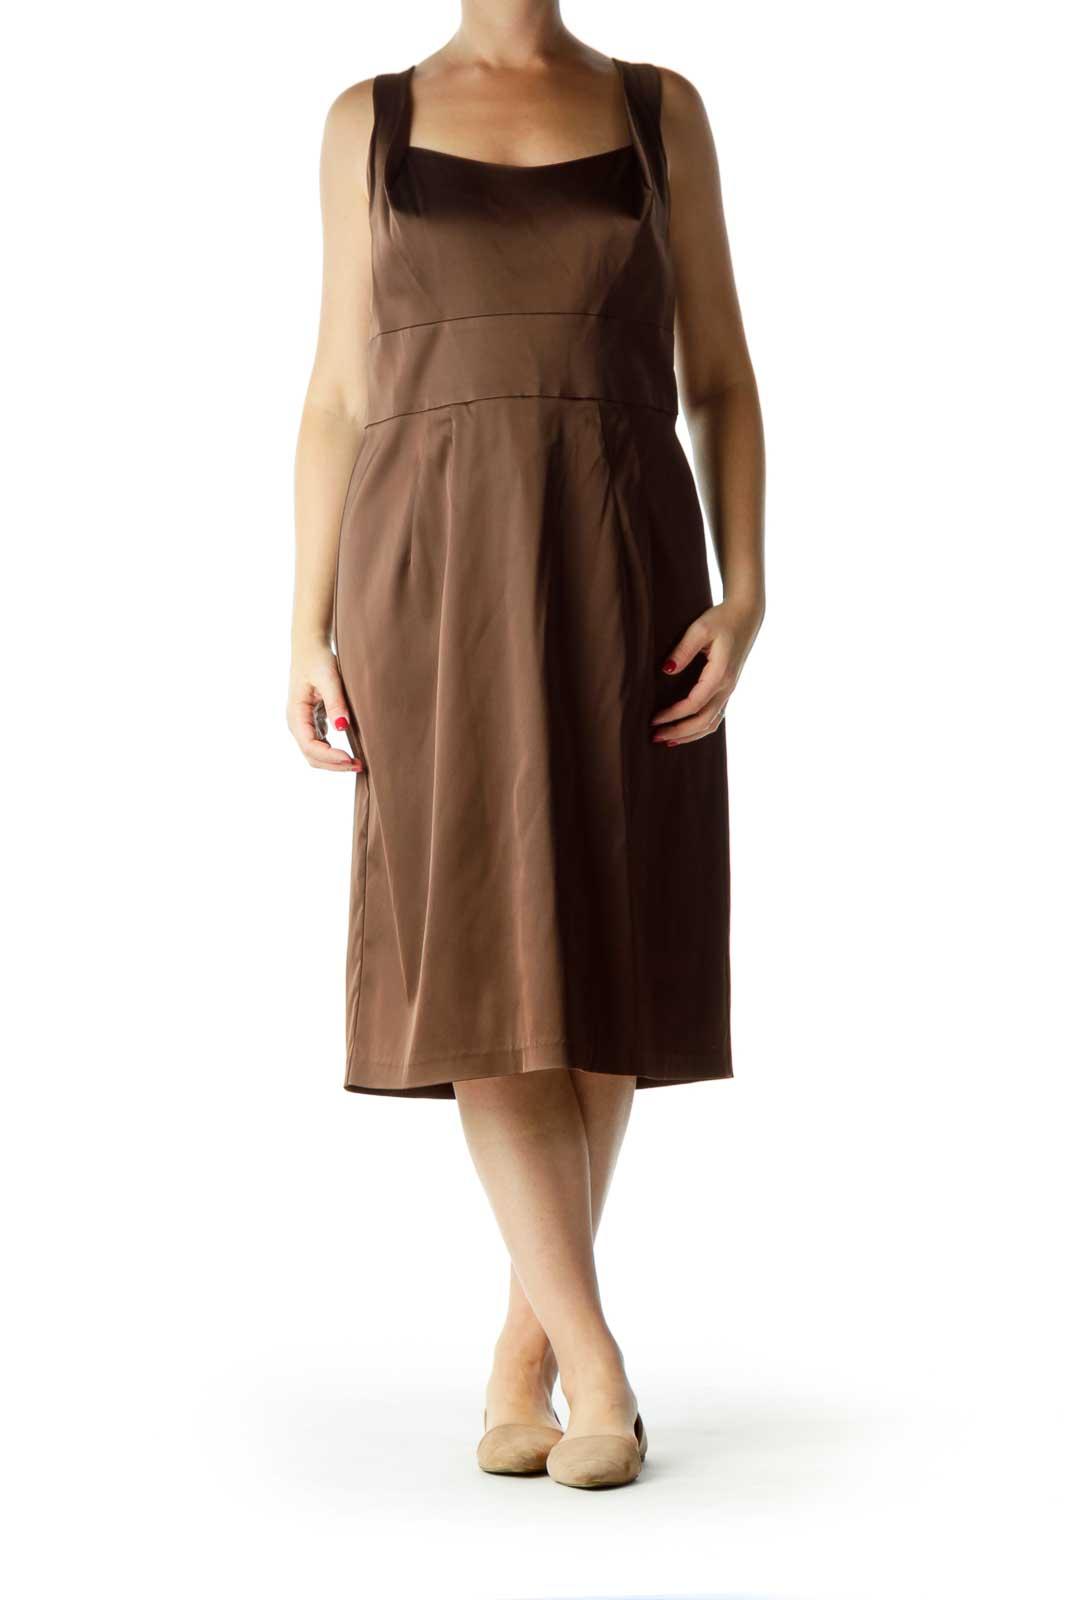 Brown Sleeveless Work Dress Front